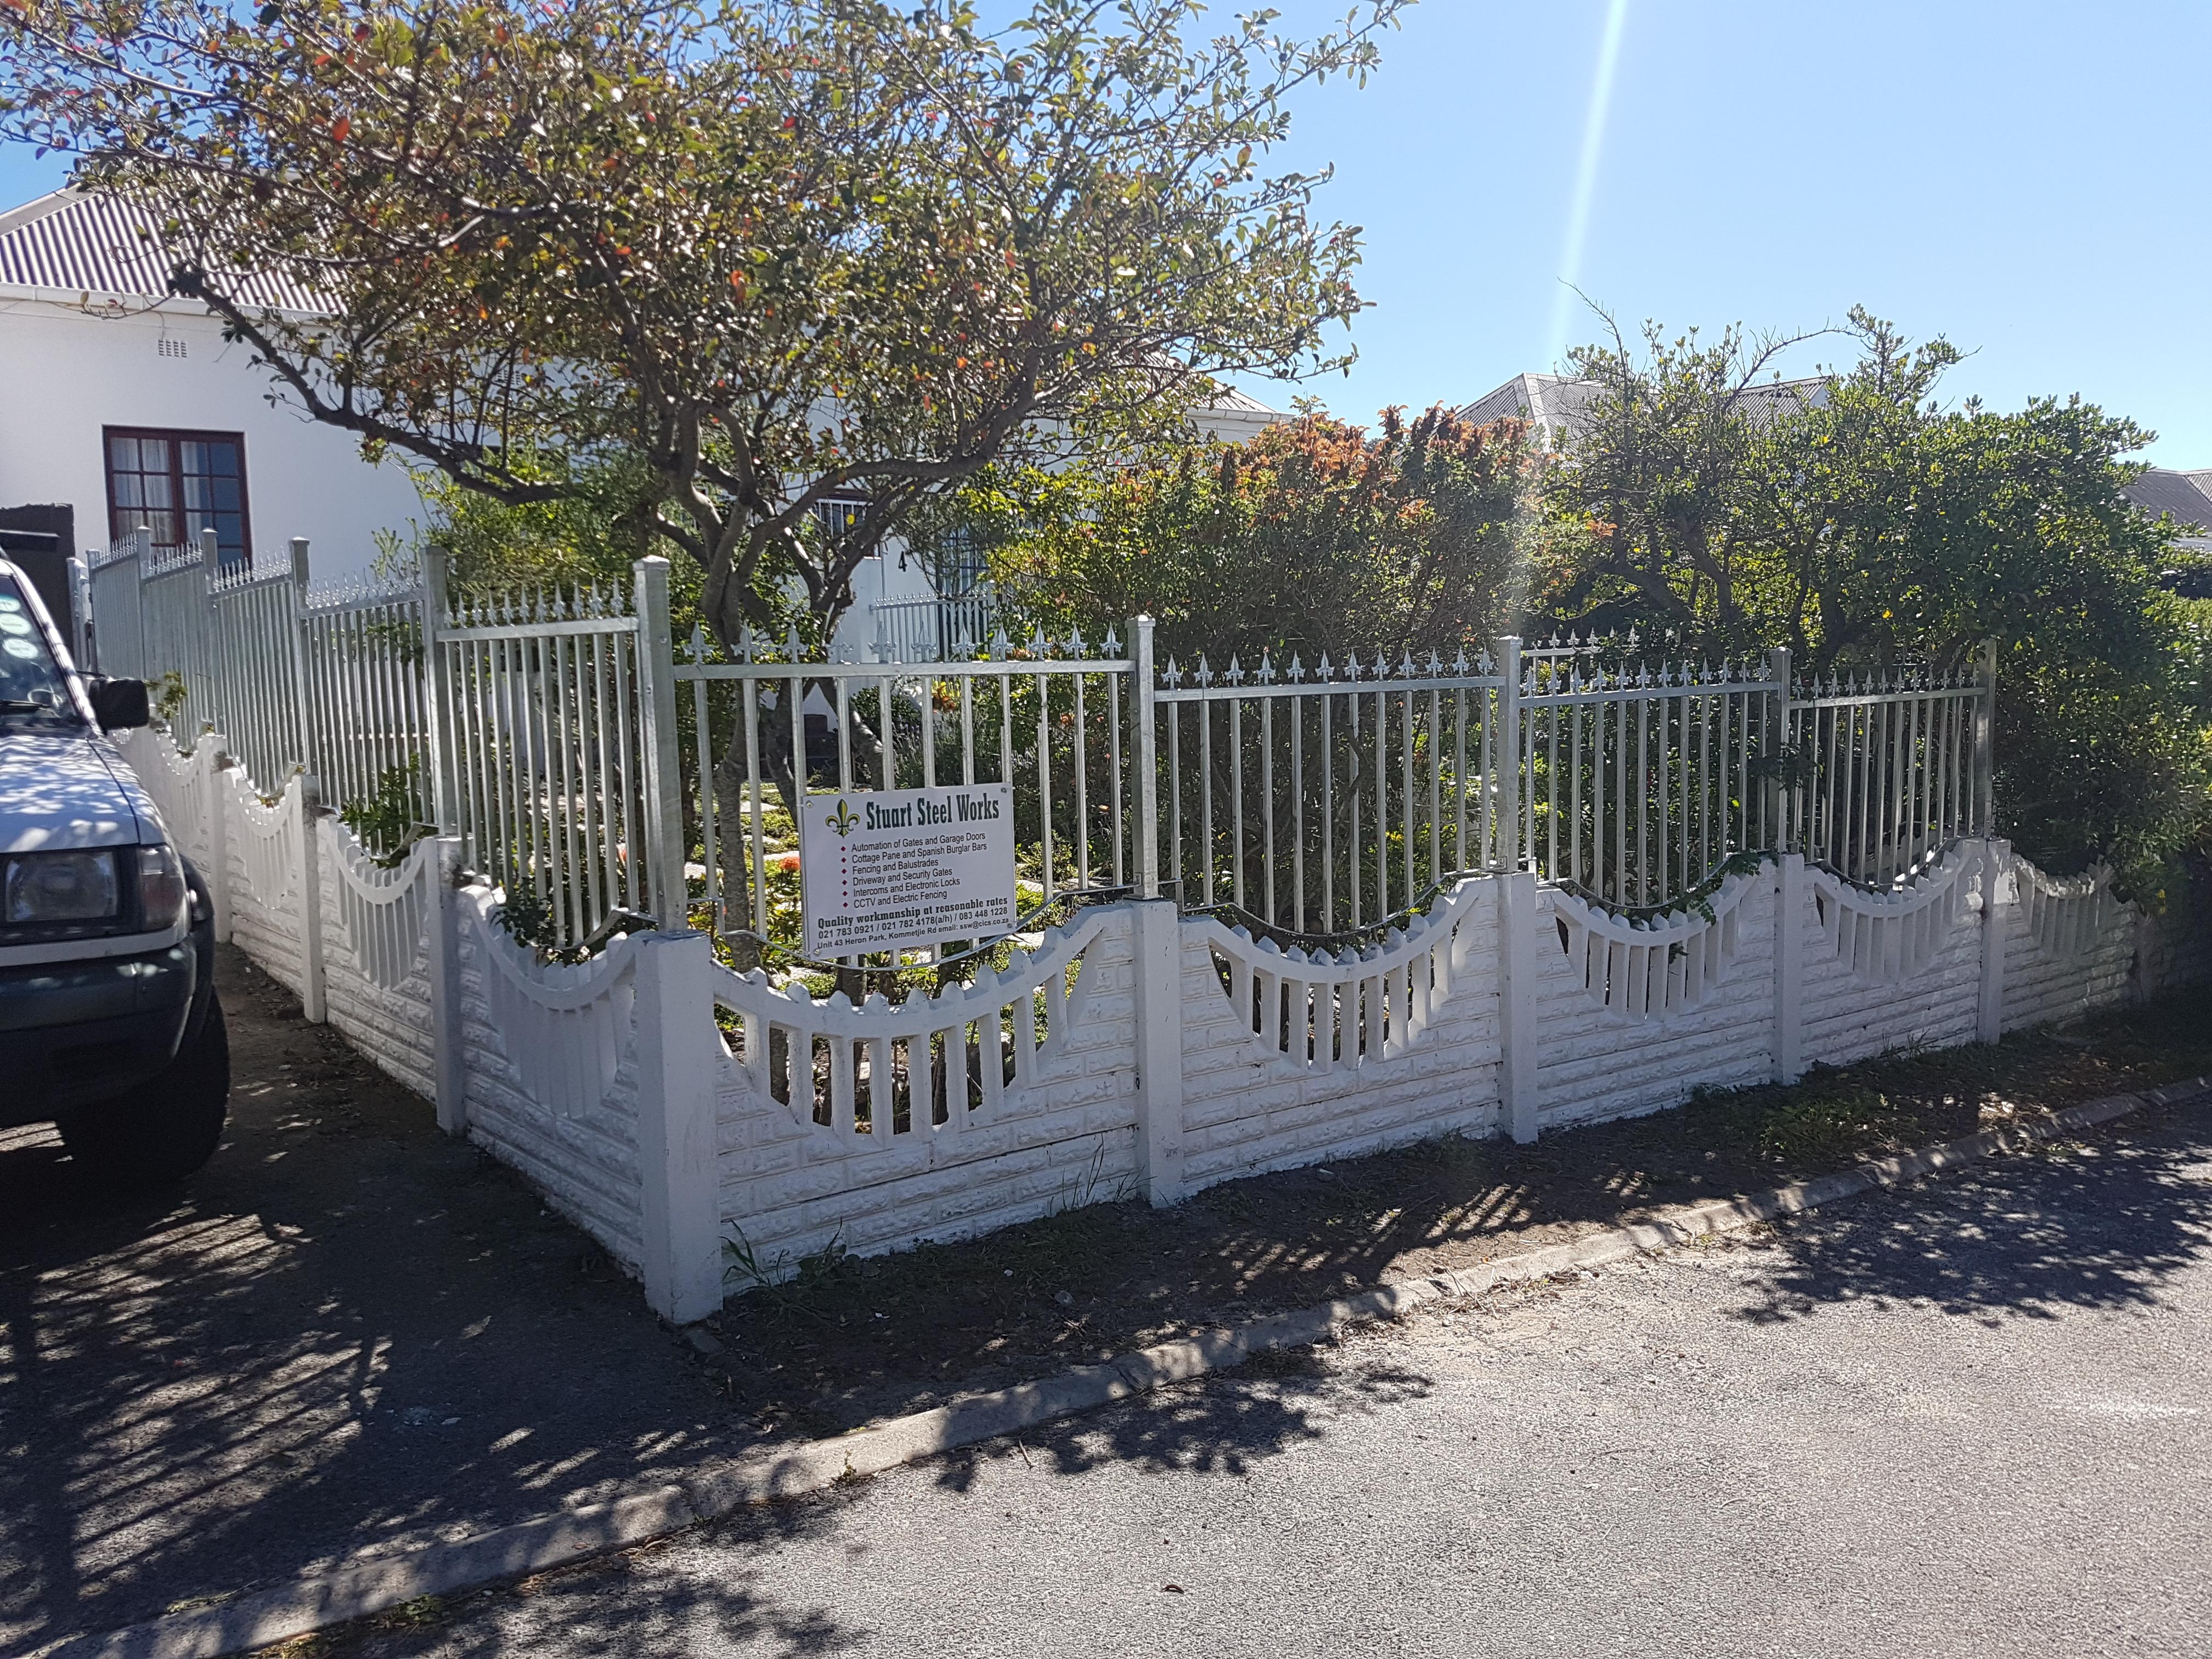 Fenceprecast